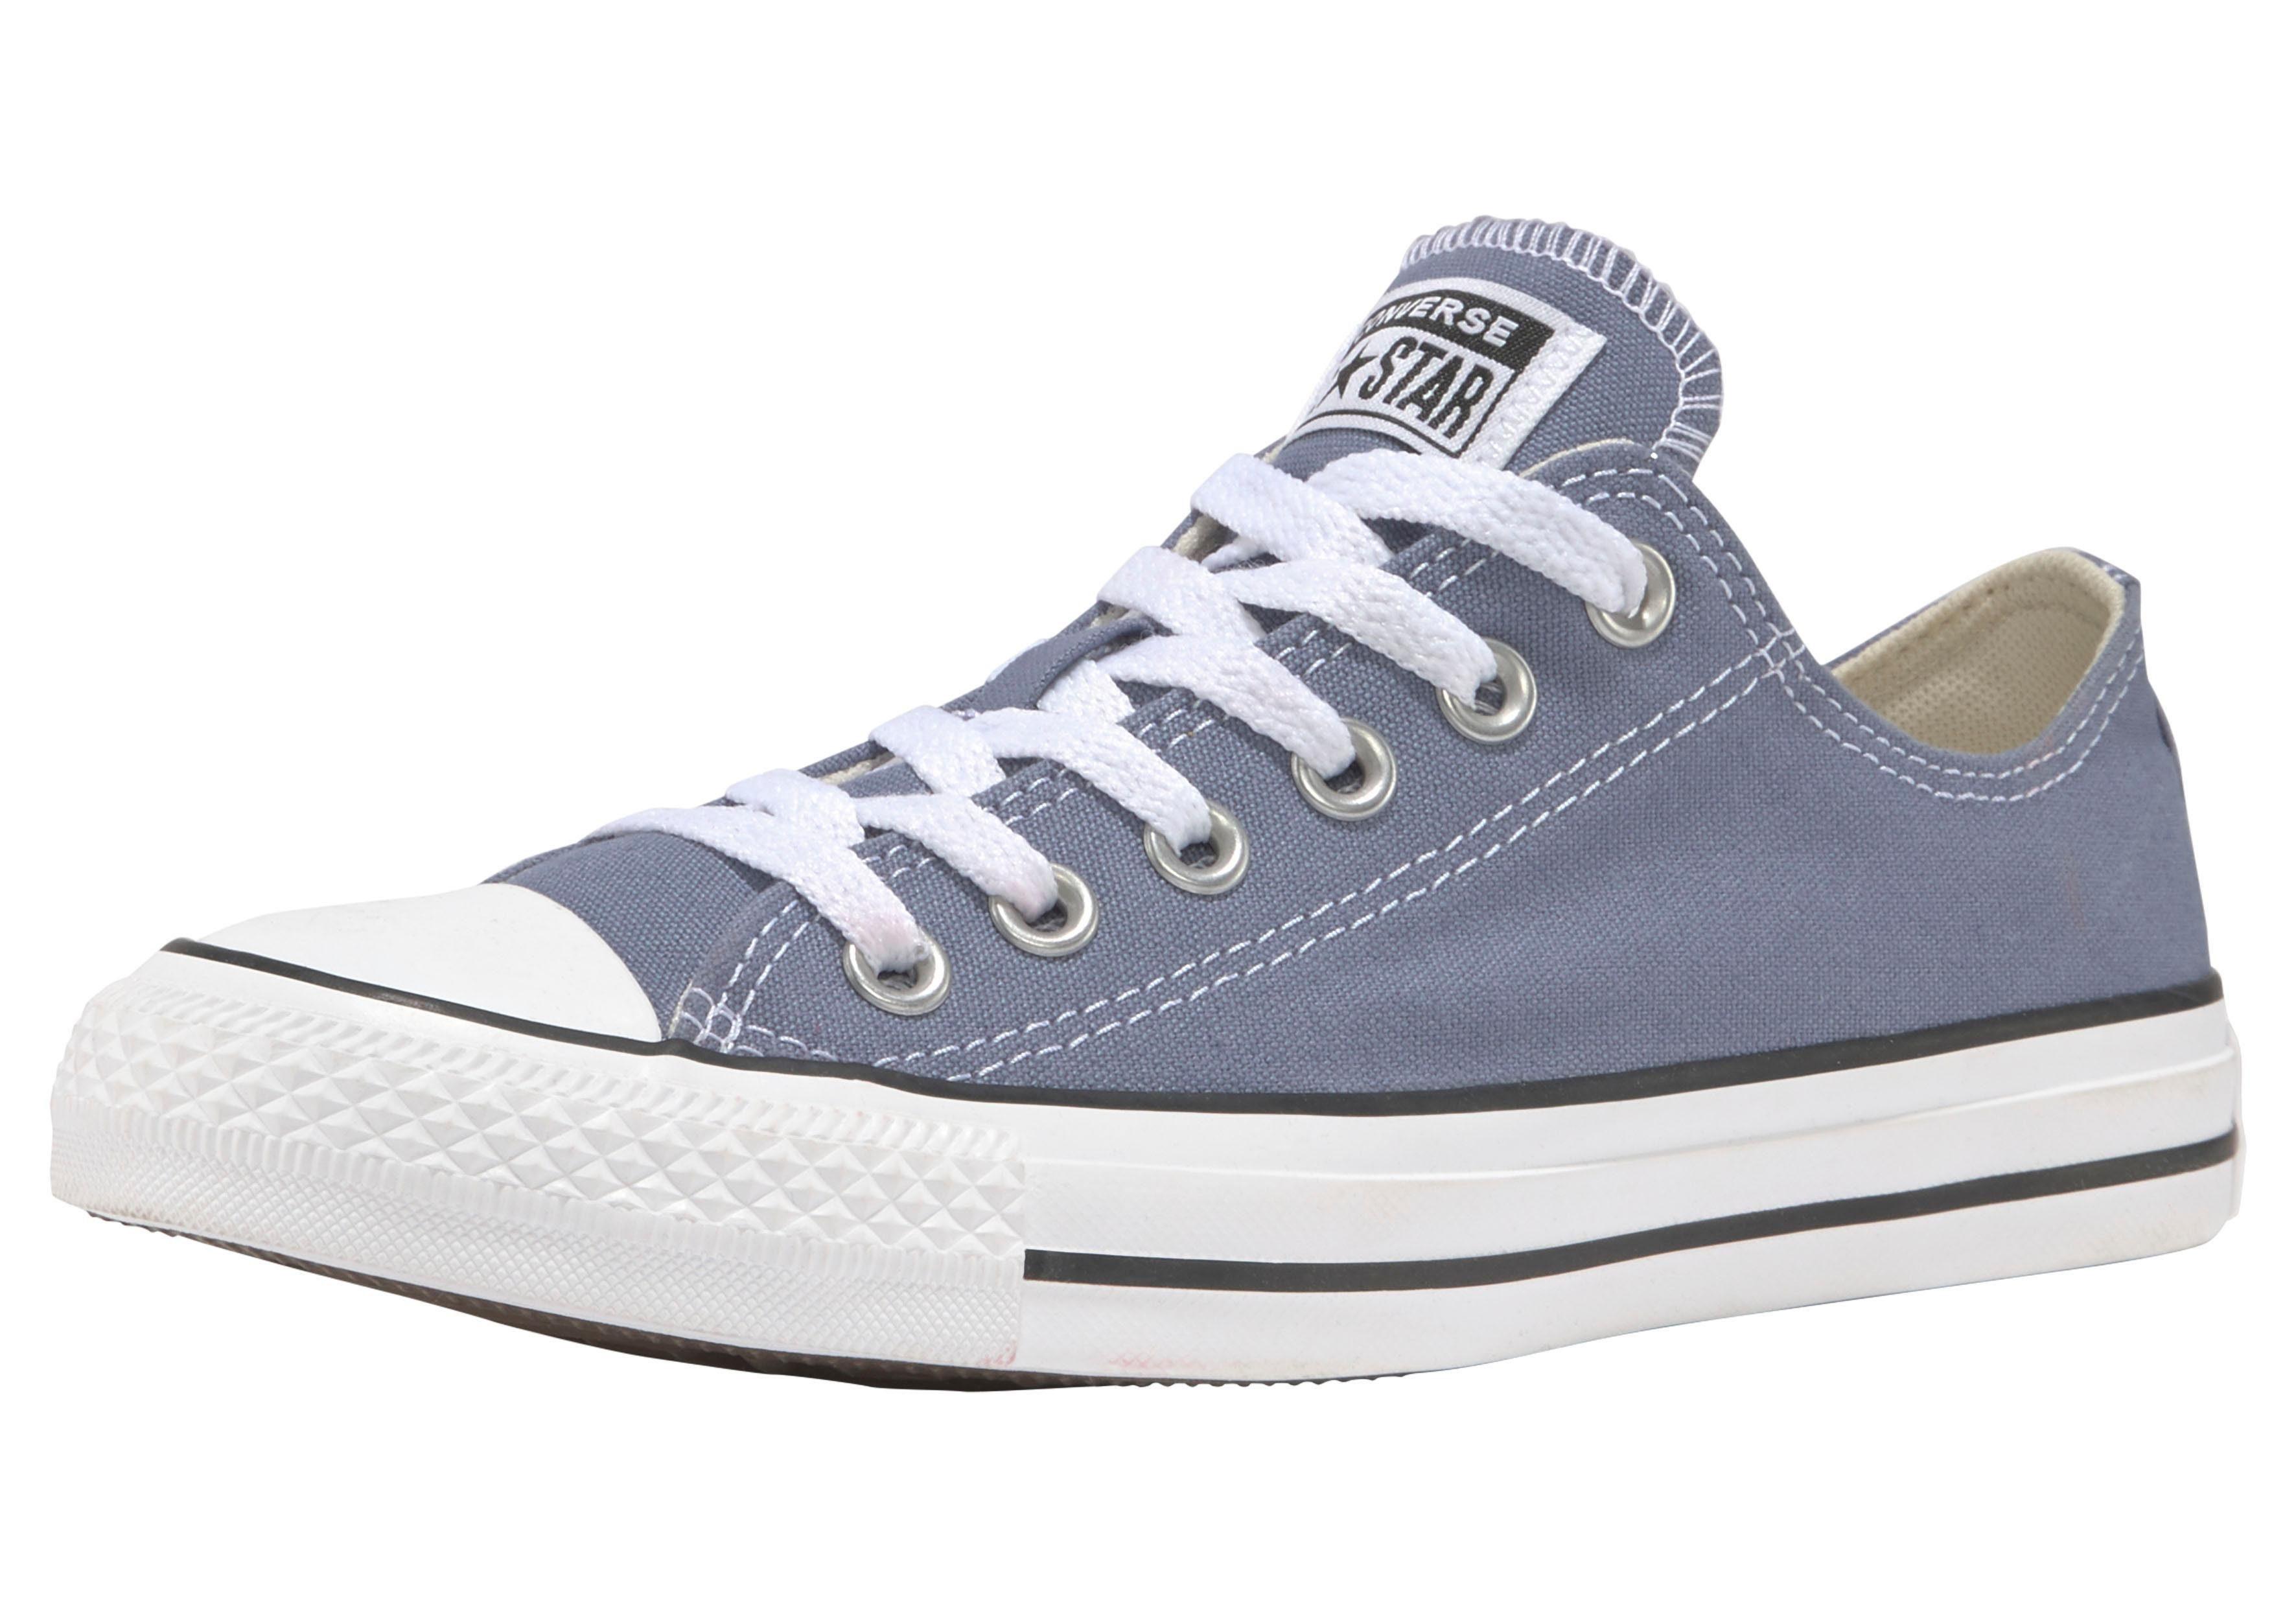 Converse »Chuck Taylor All Star Seasonal Color Ox« Sneaker online kaufen | OTTO